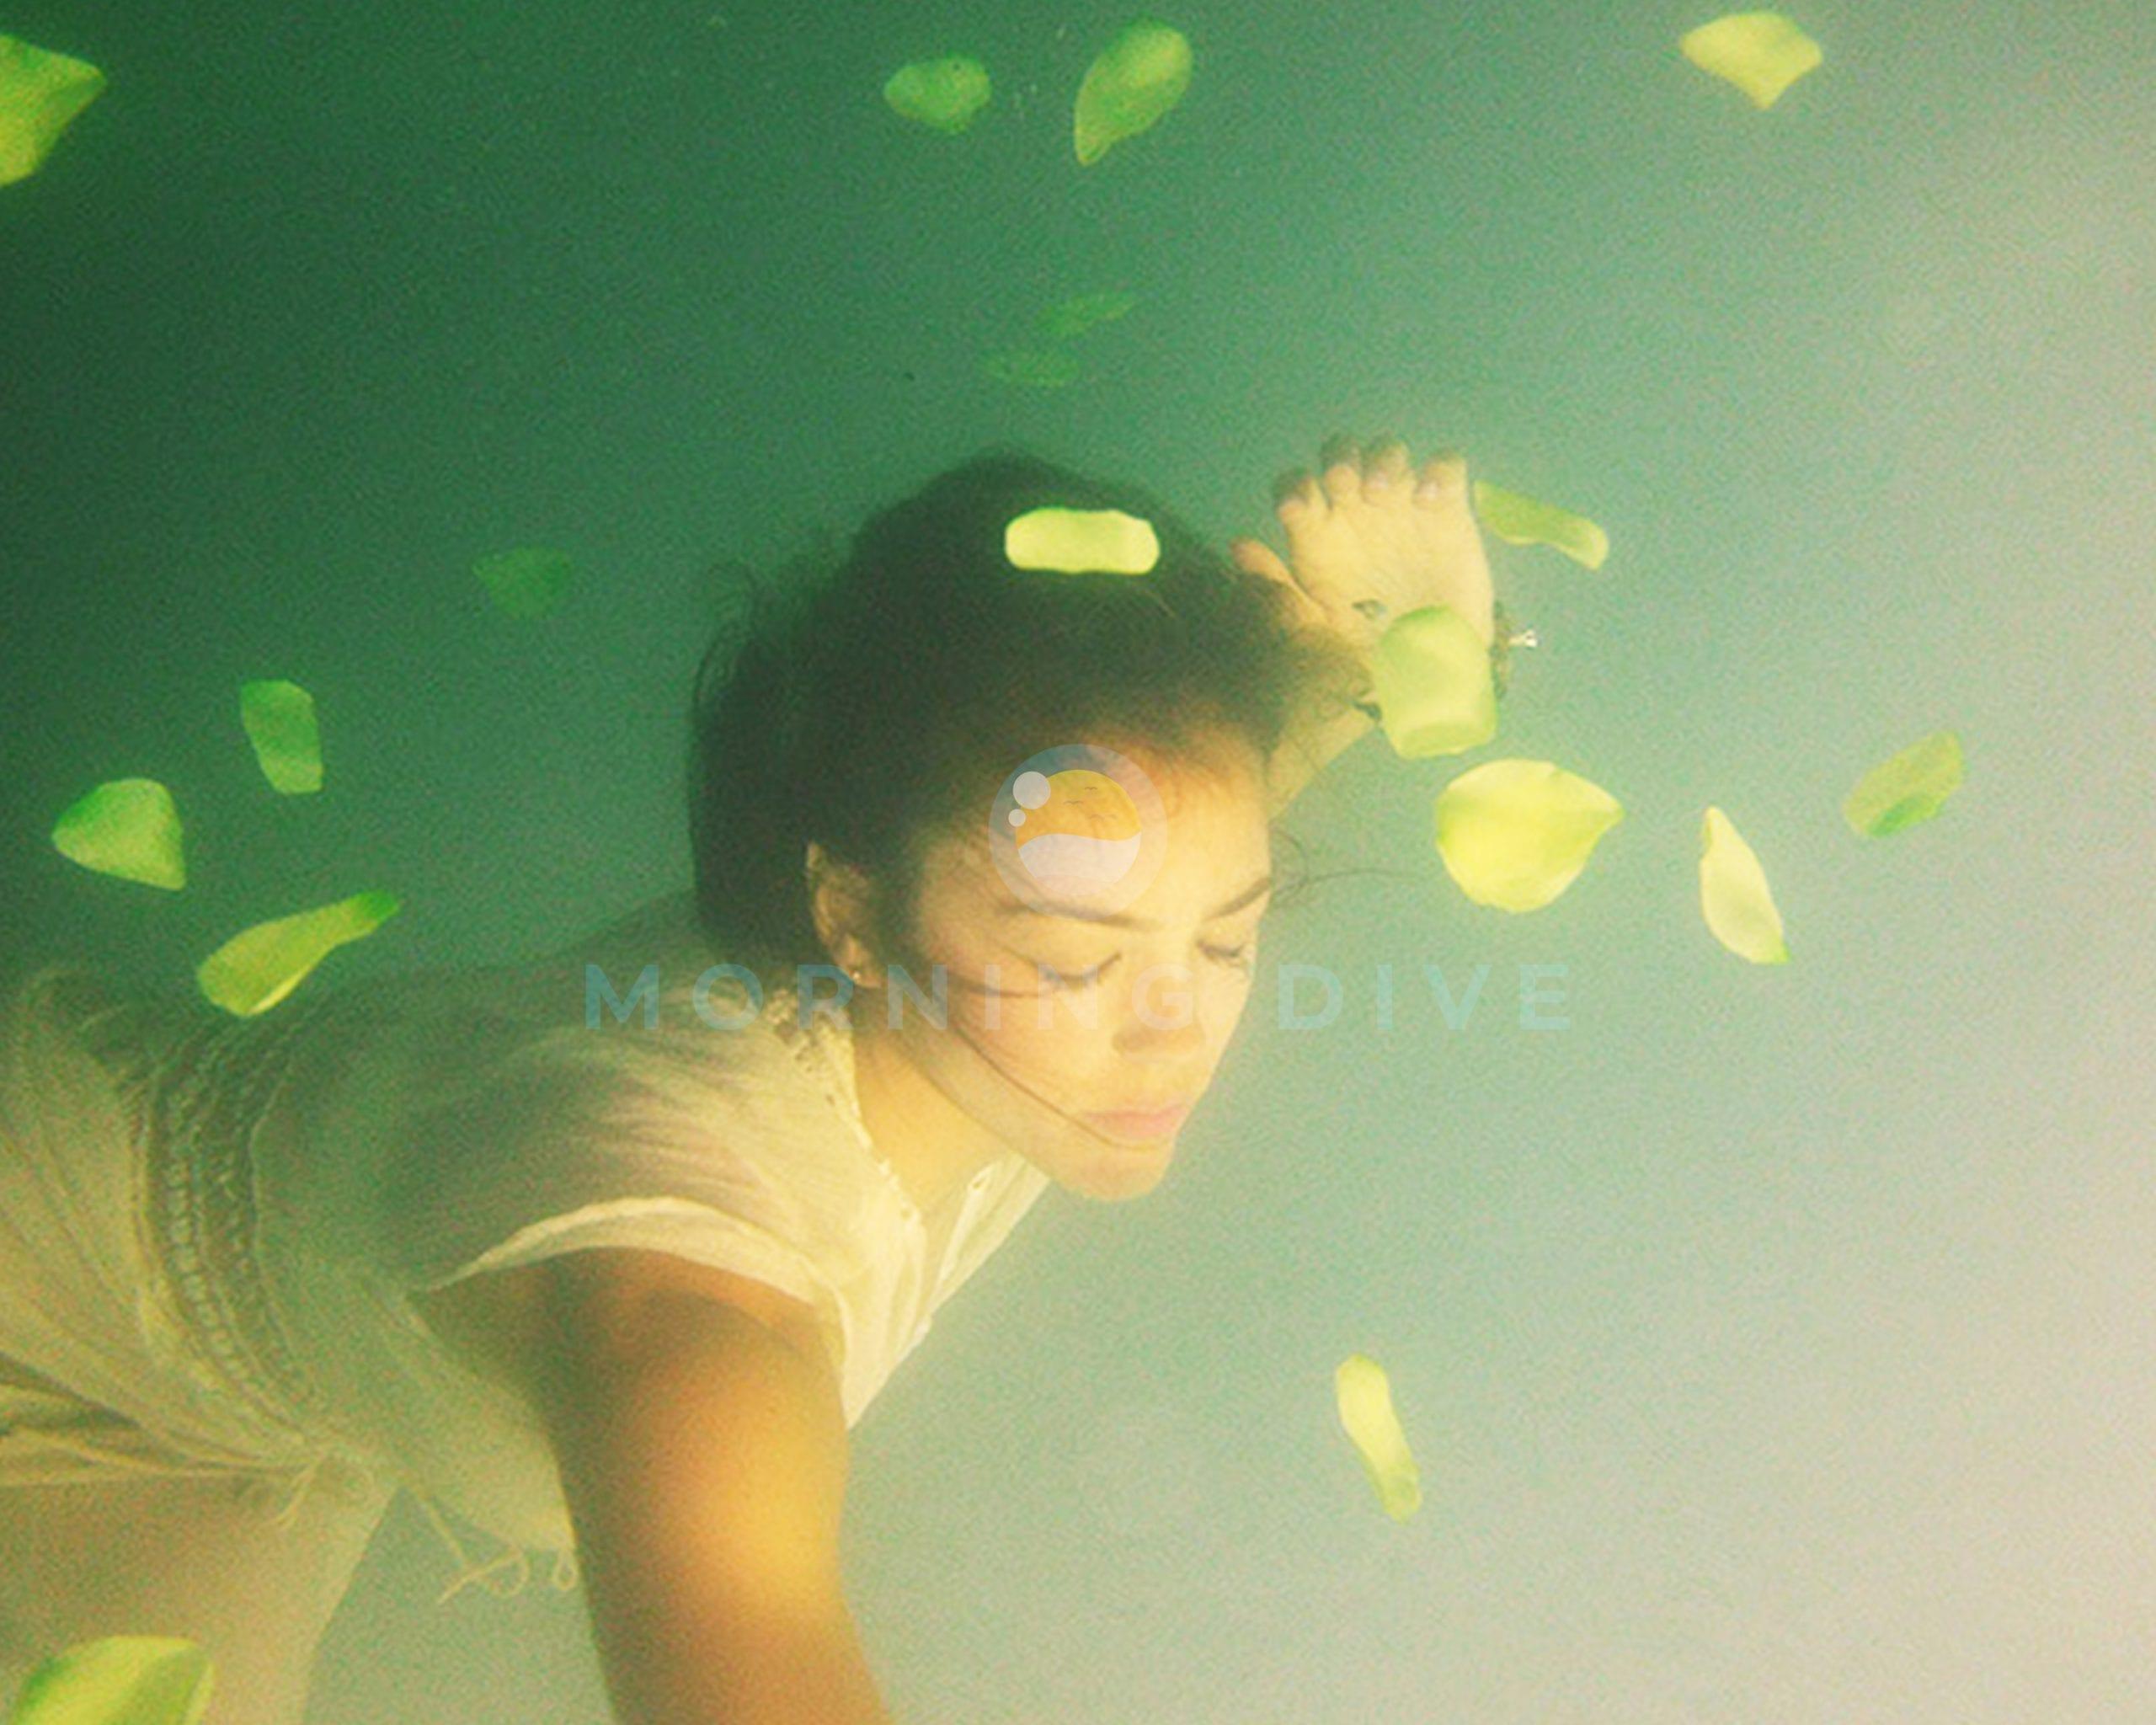 underwater photography pool women